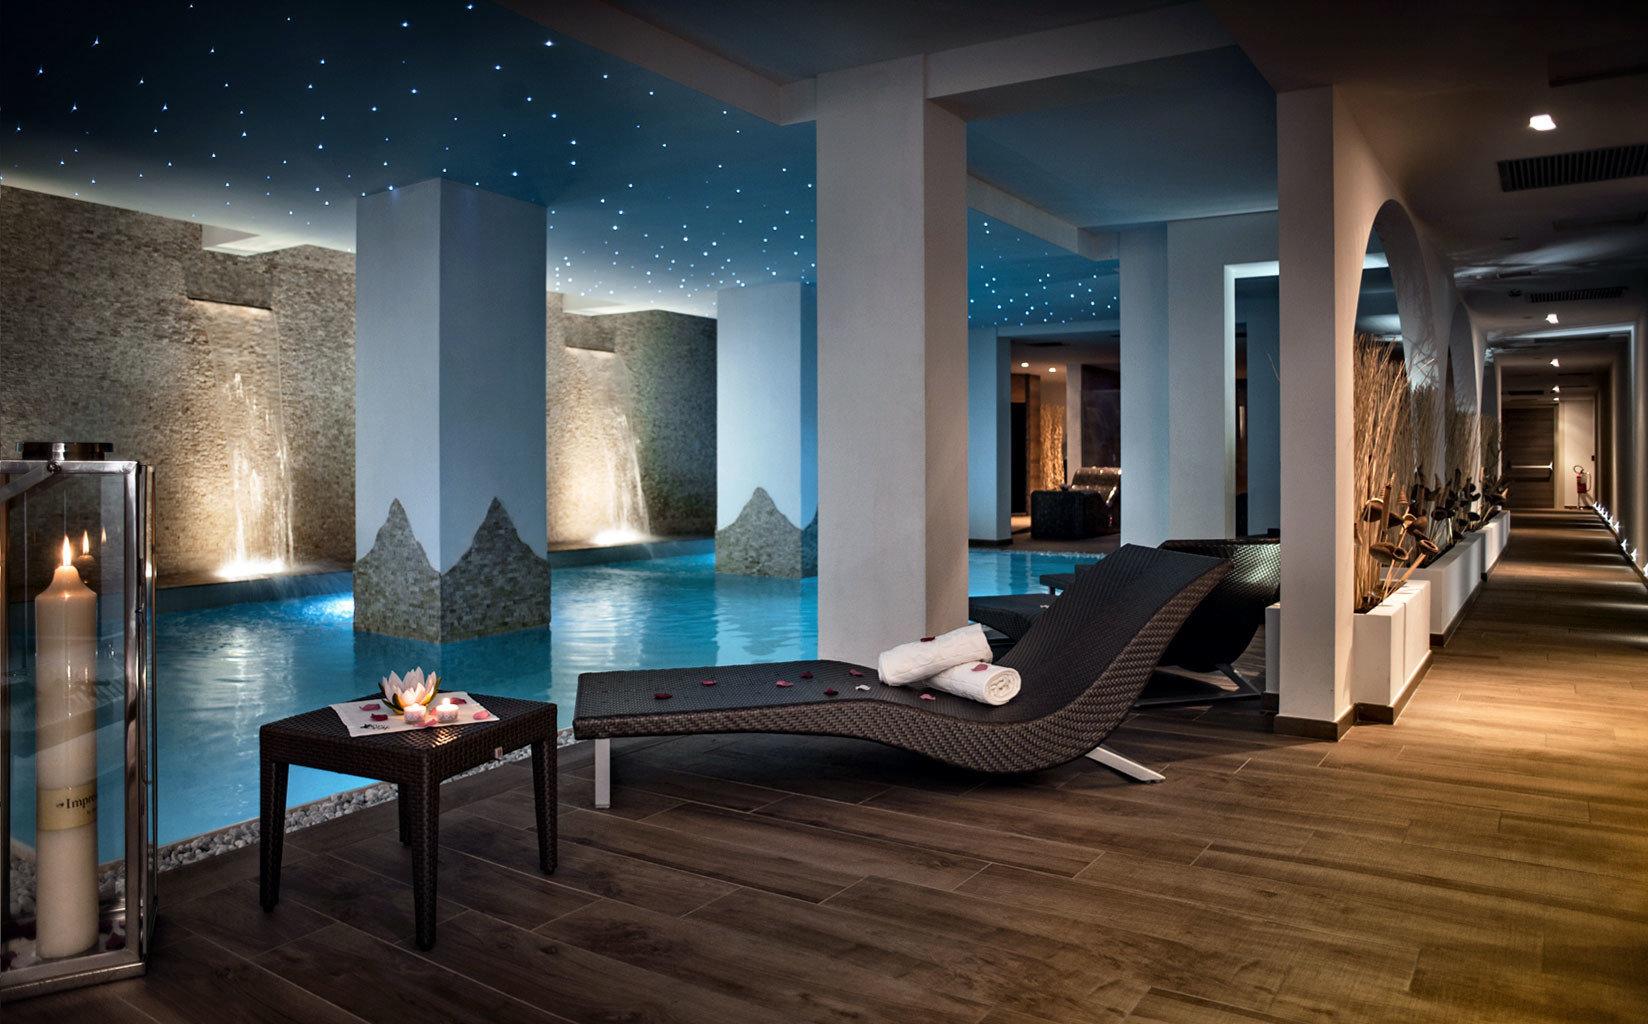 Hip Luxury Pool Spa Wellness property Lobby swimming pool living room lighting flooring mansion